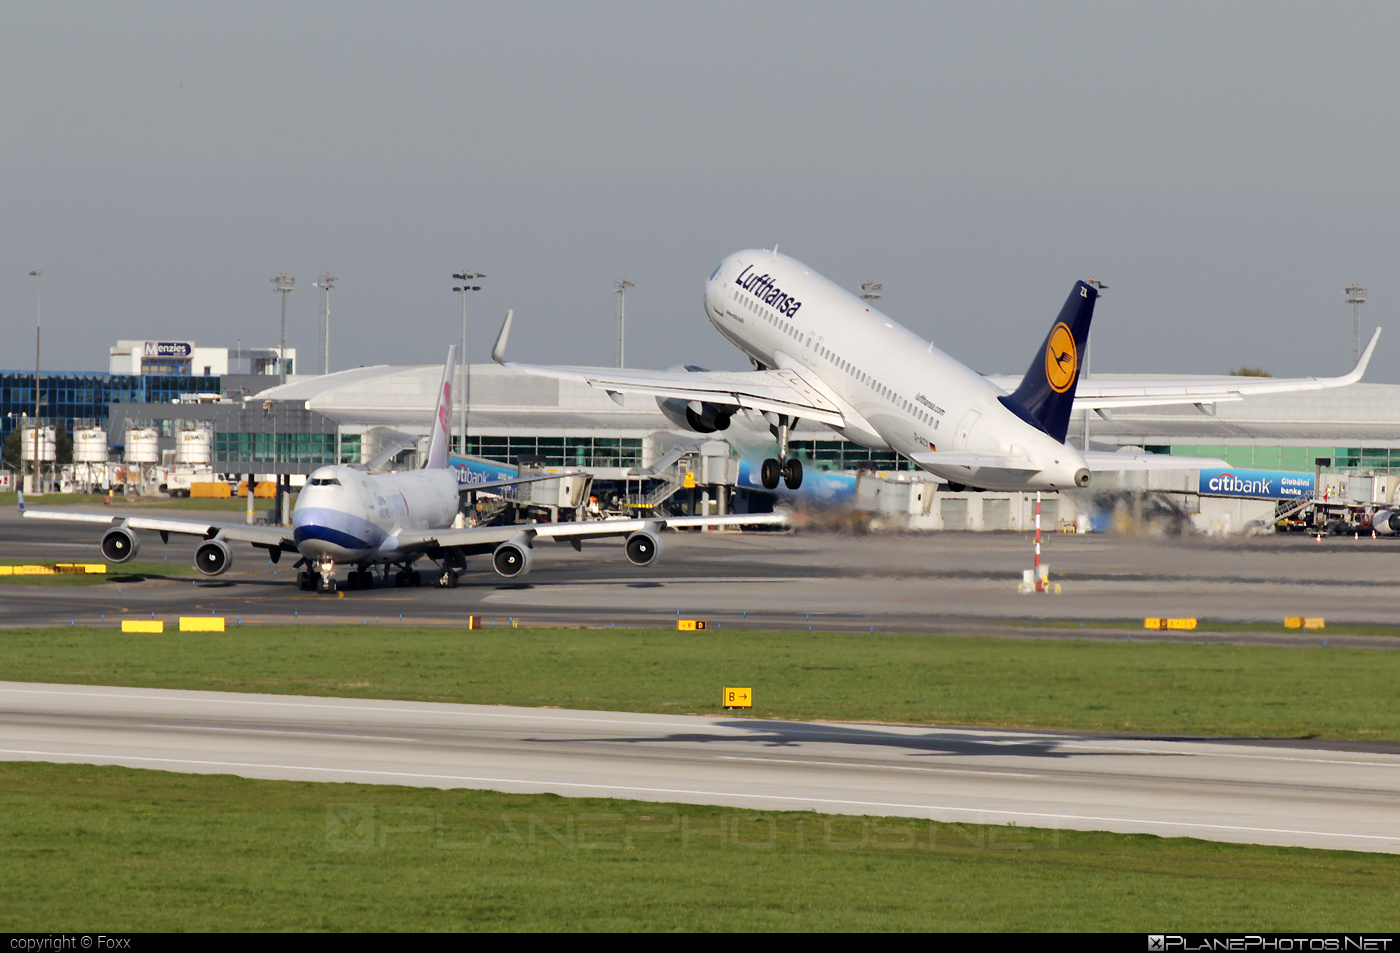 Airbus A320-214 - D-AIZX operated by Lufthansa #a320 #a320family #airbus #airbus320 #lufthansa